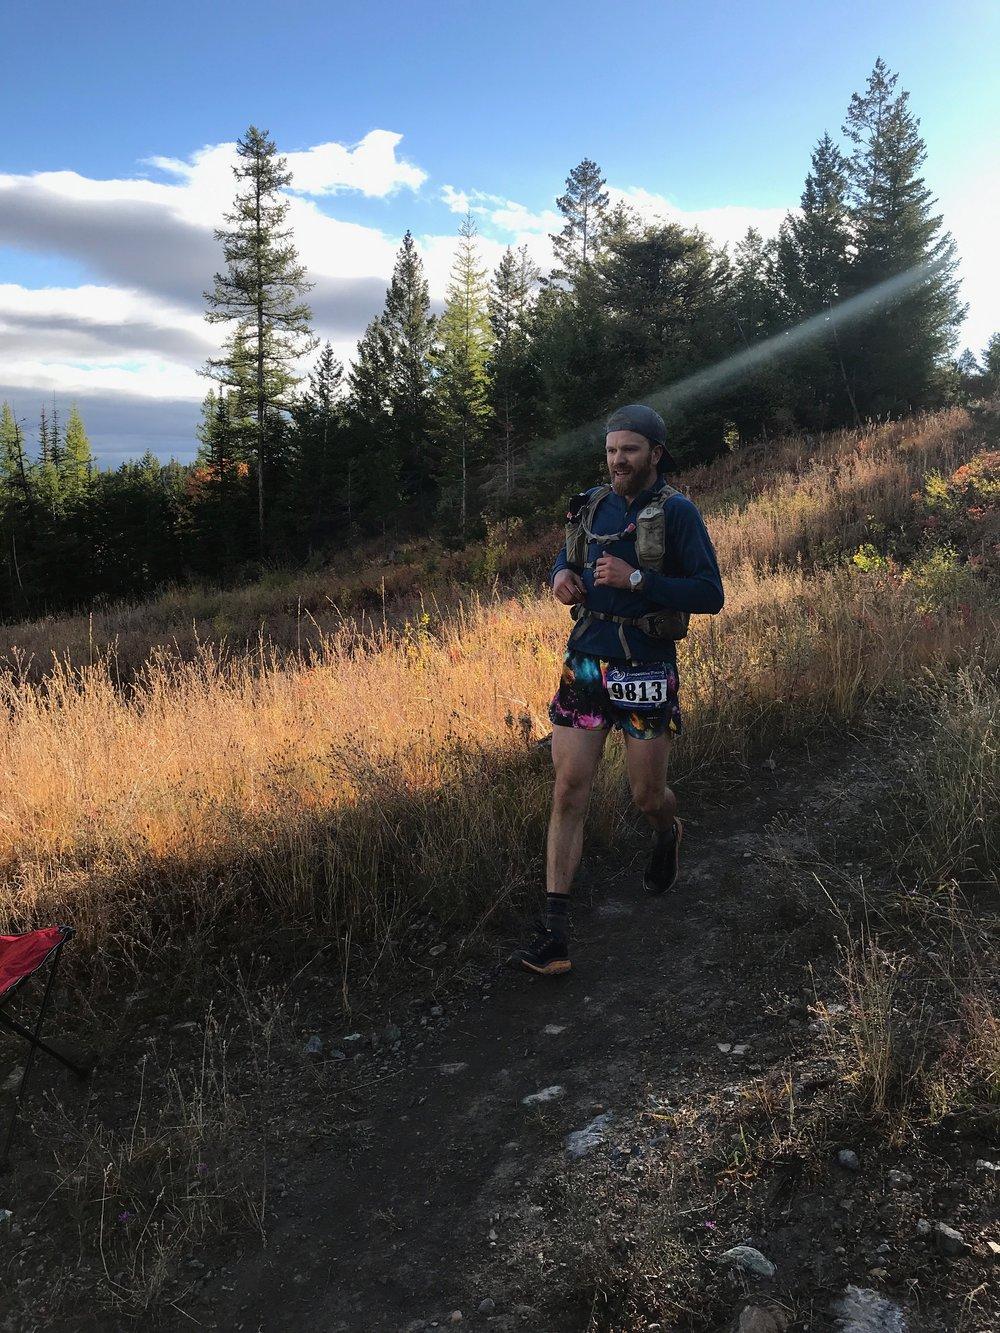 foys to blacktail trails trail marathon ftbtIMG_1746.JPG